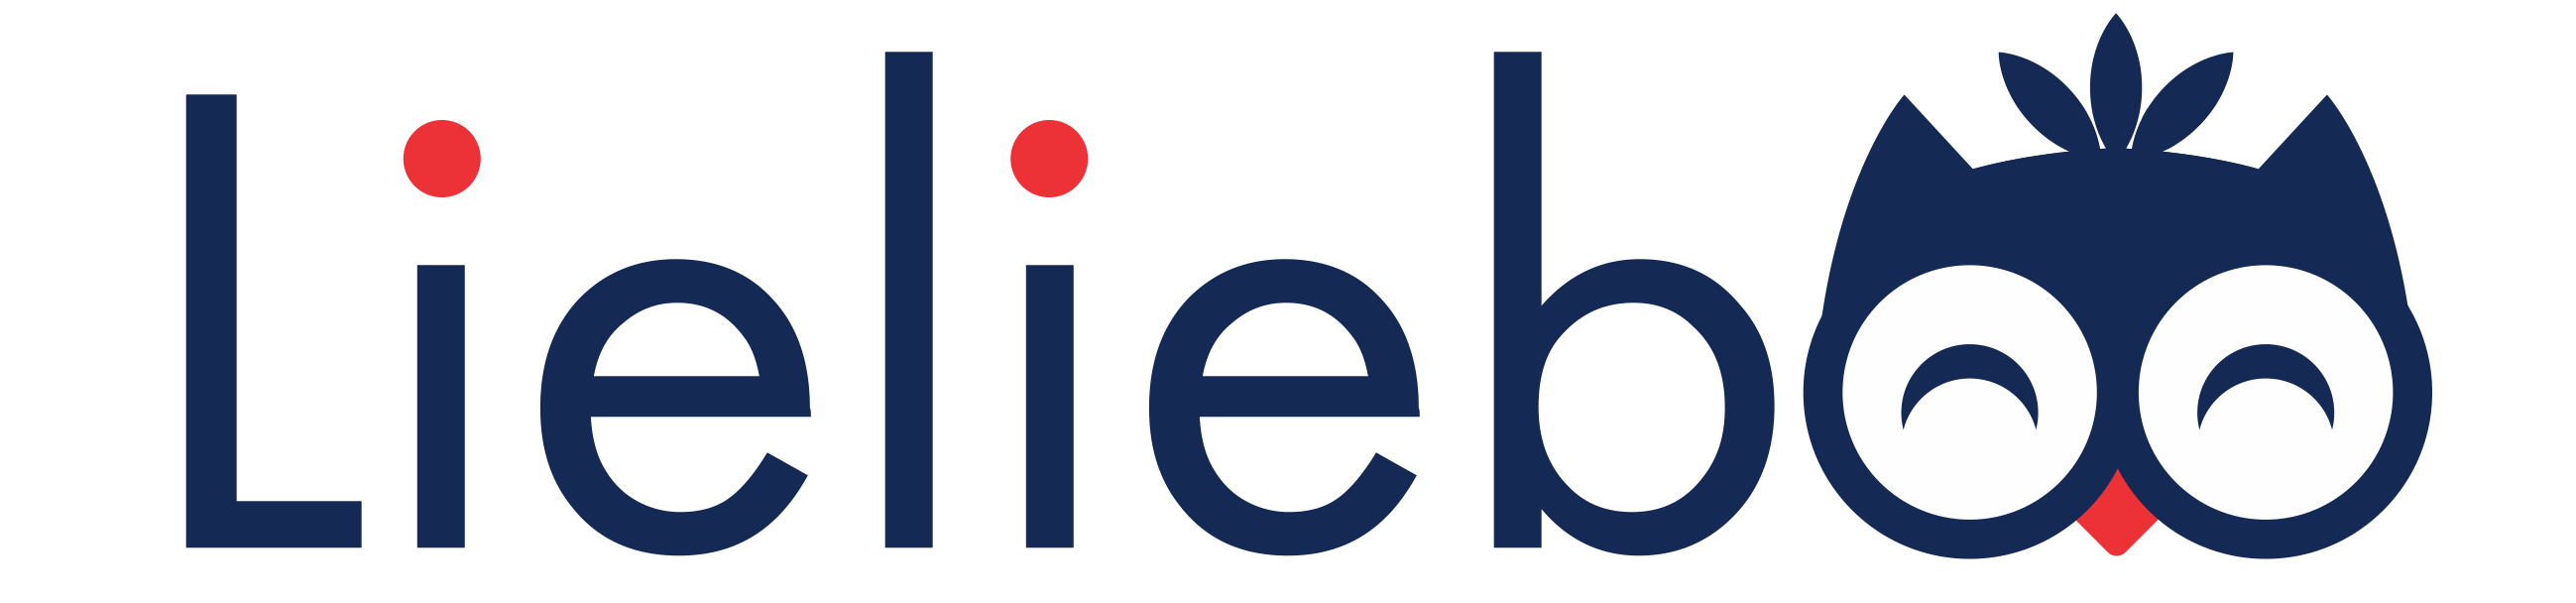 LielieBoo